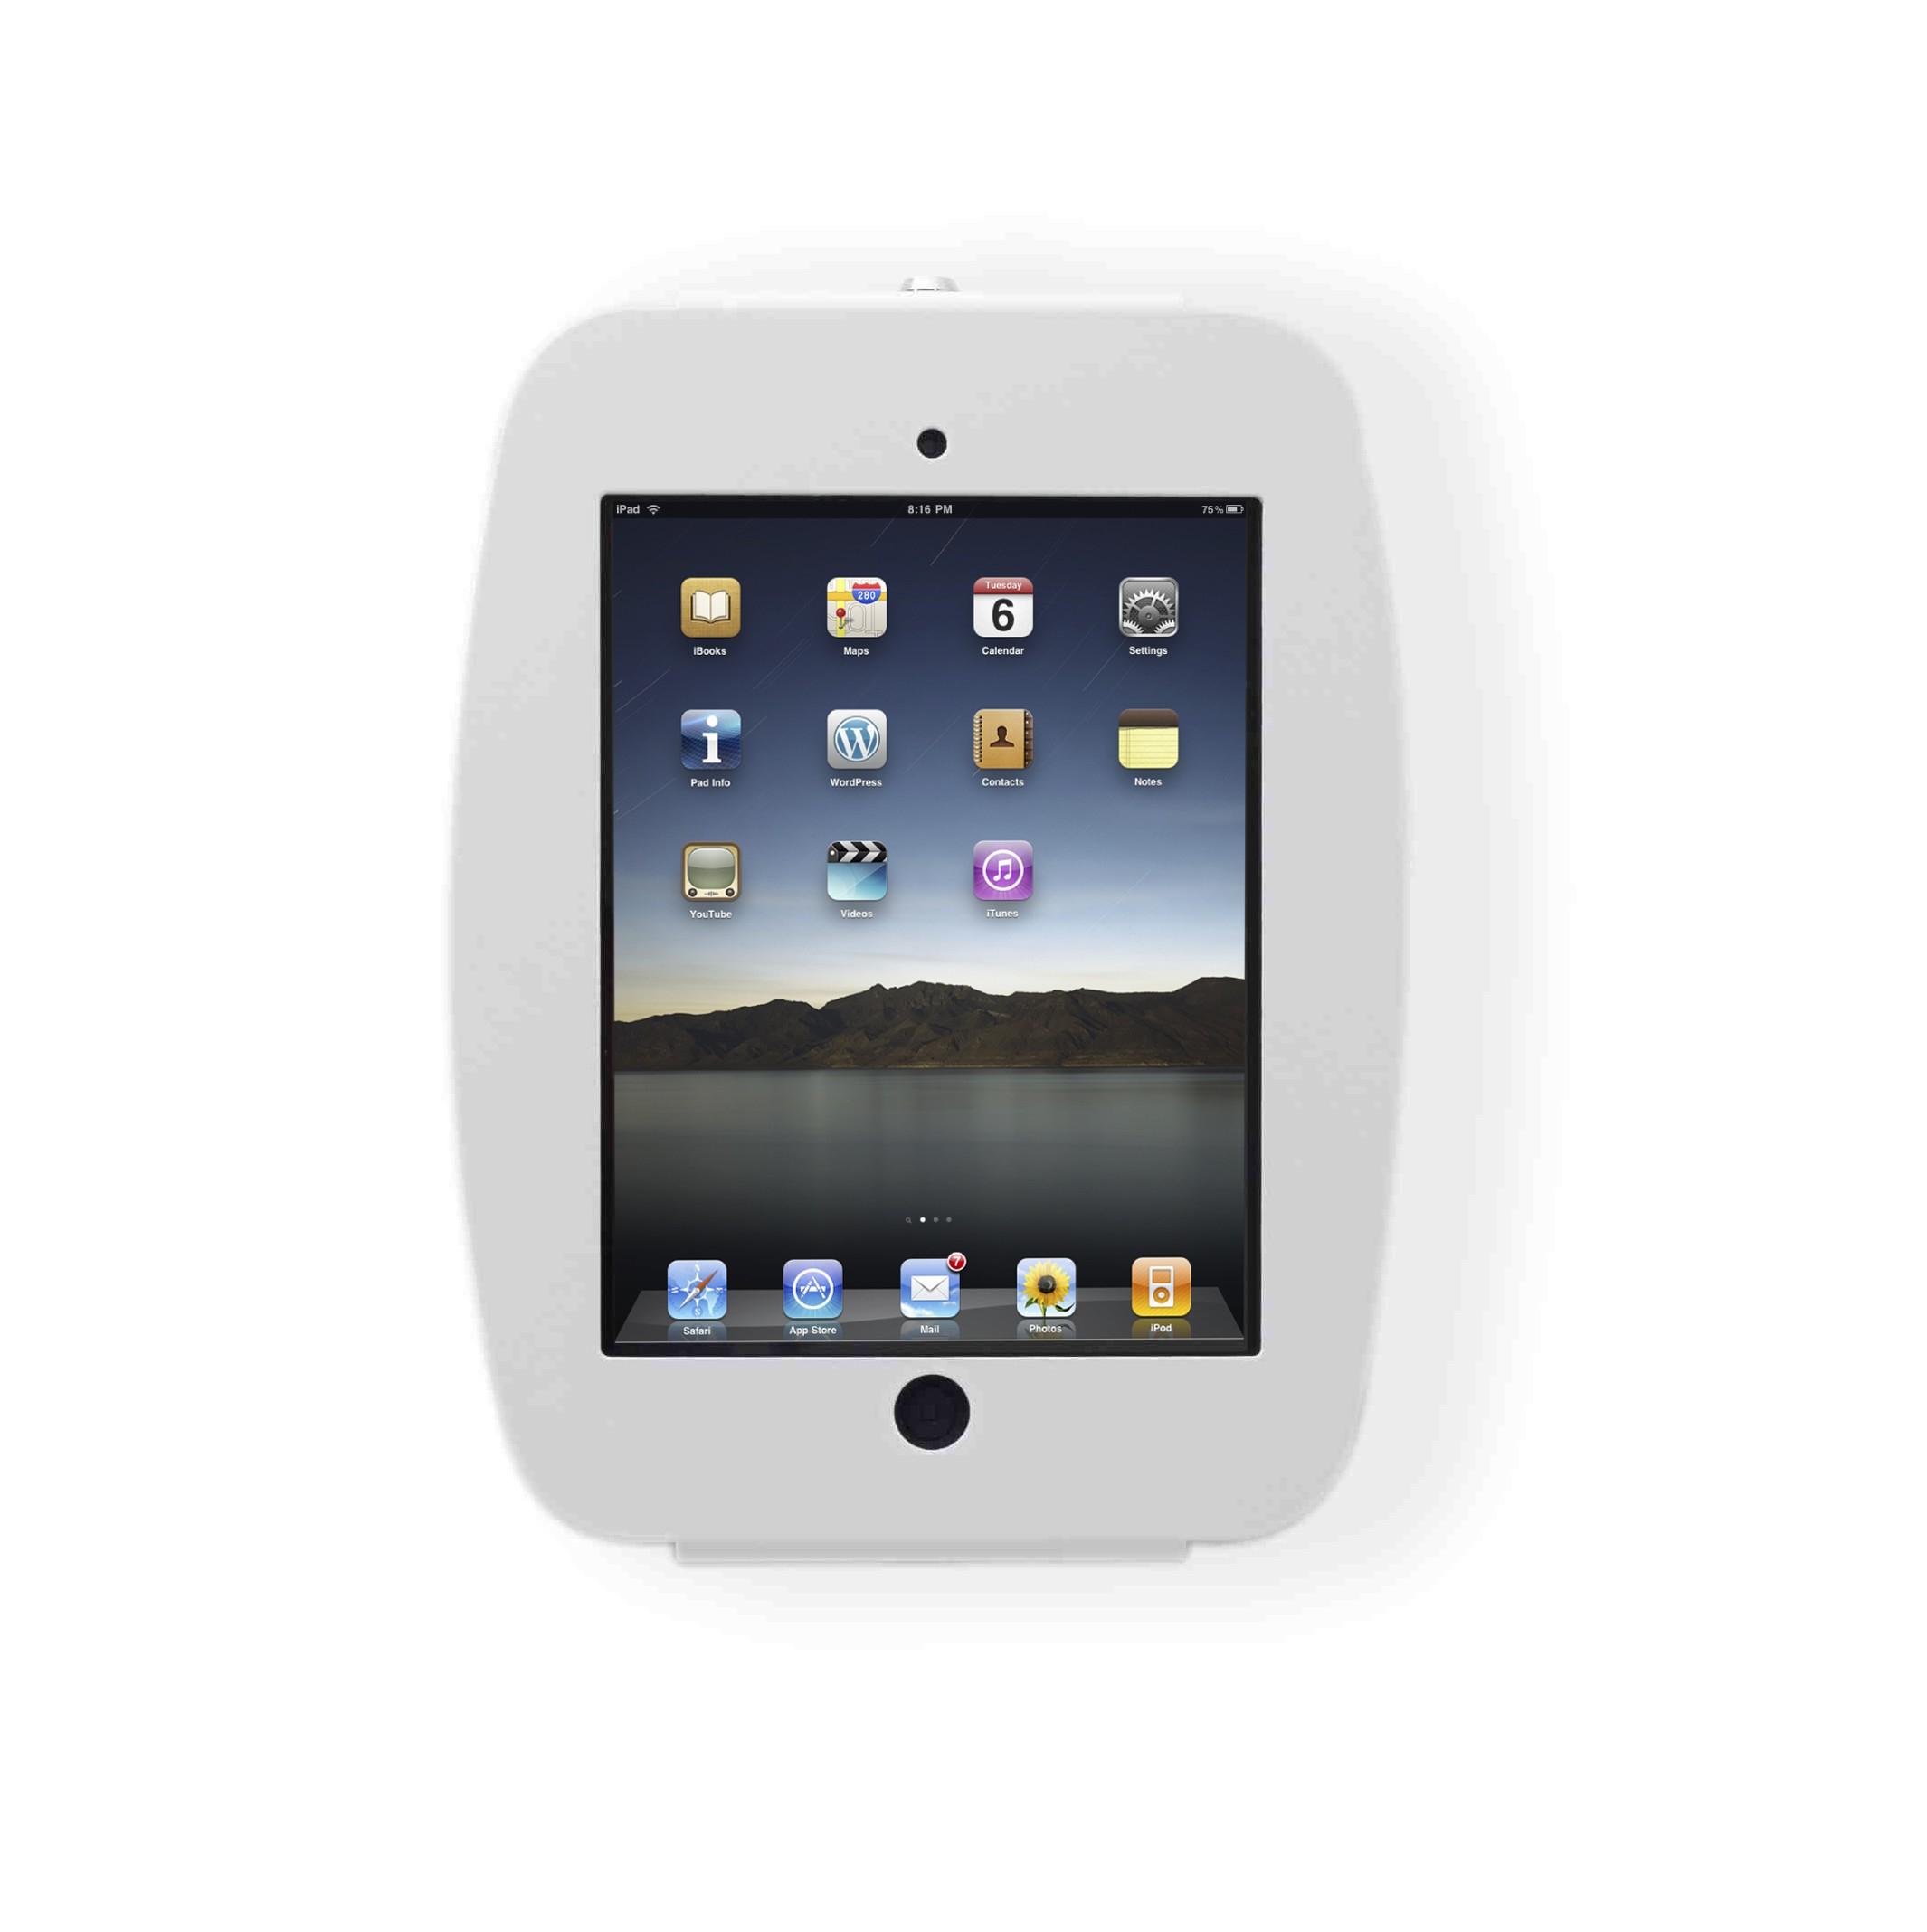 Maclocks Apple iPad 2/3/4 Space Enclosure Series Wall Mount Case - White - (224SENW)